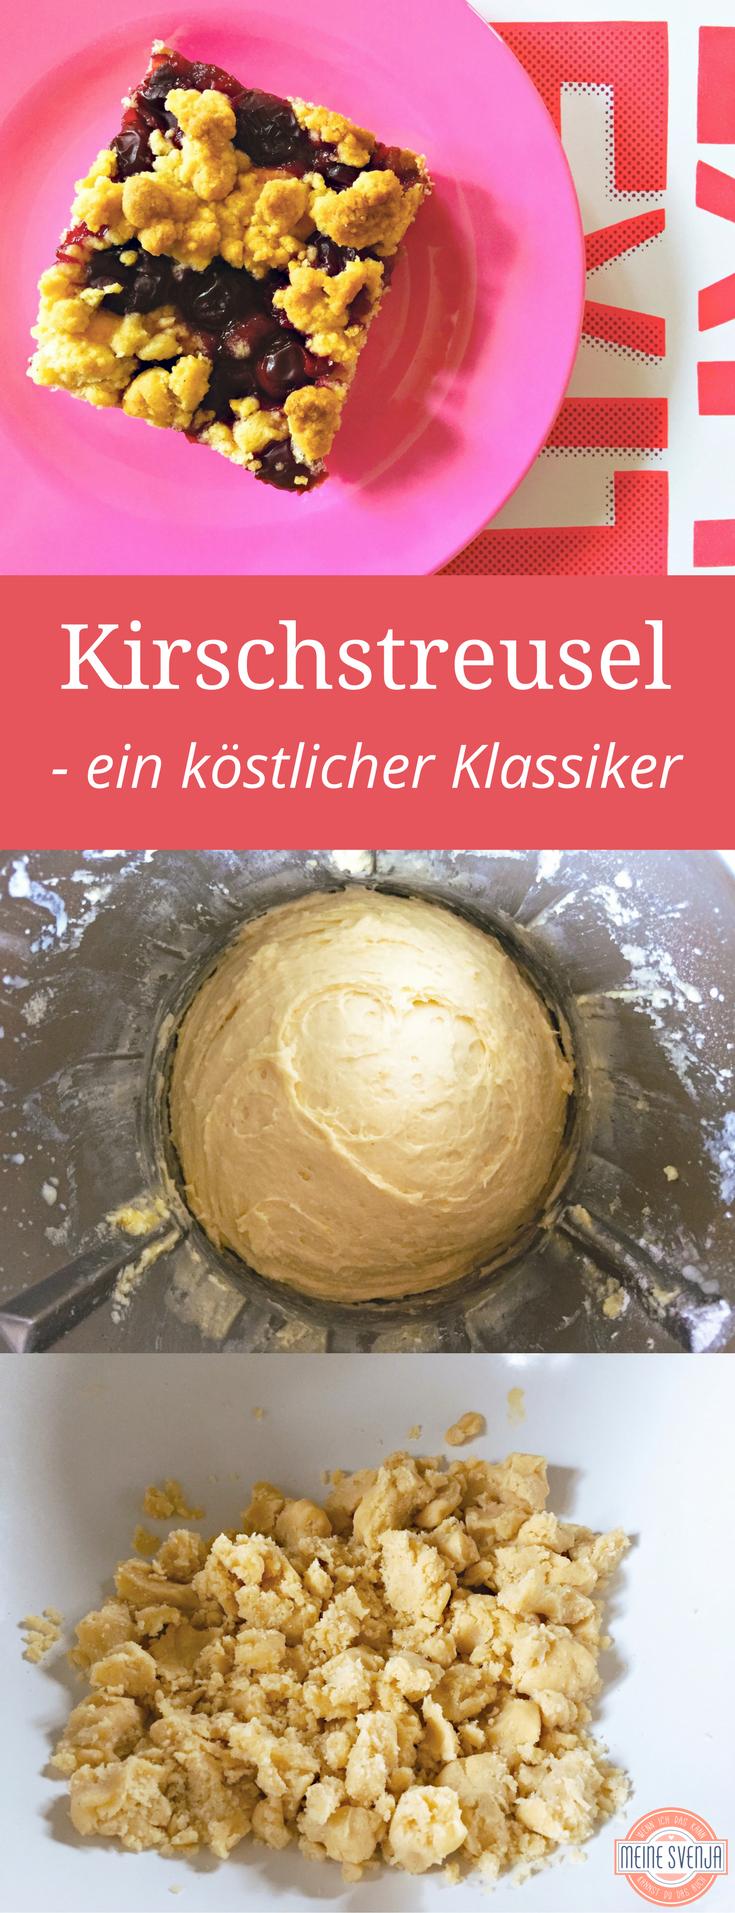 Meine Svenja Kirschstreusel Vom Blech Food Pinterest